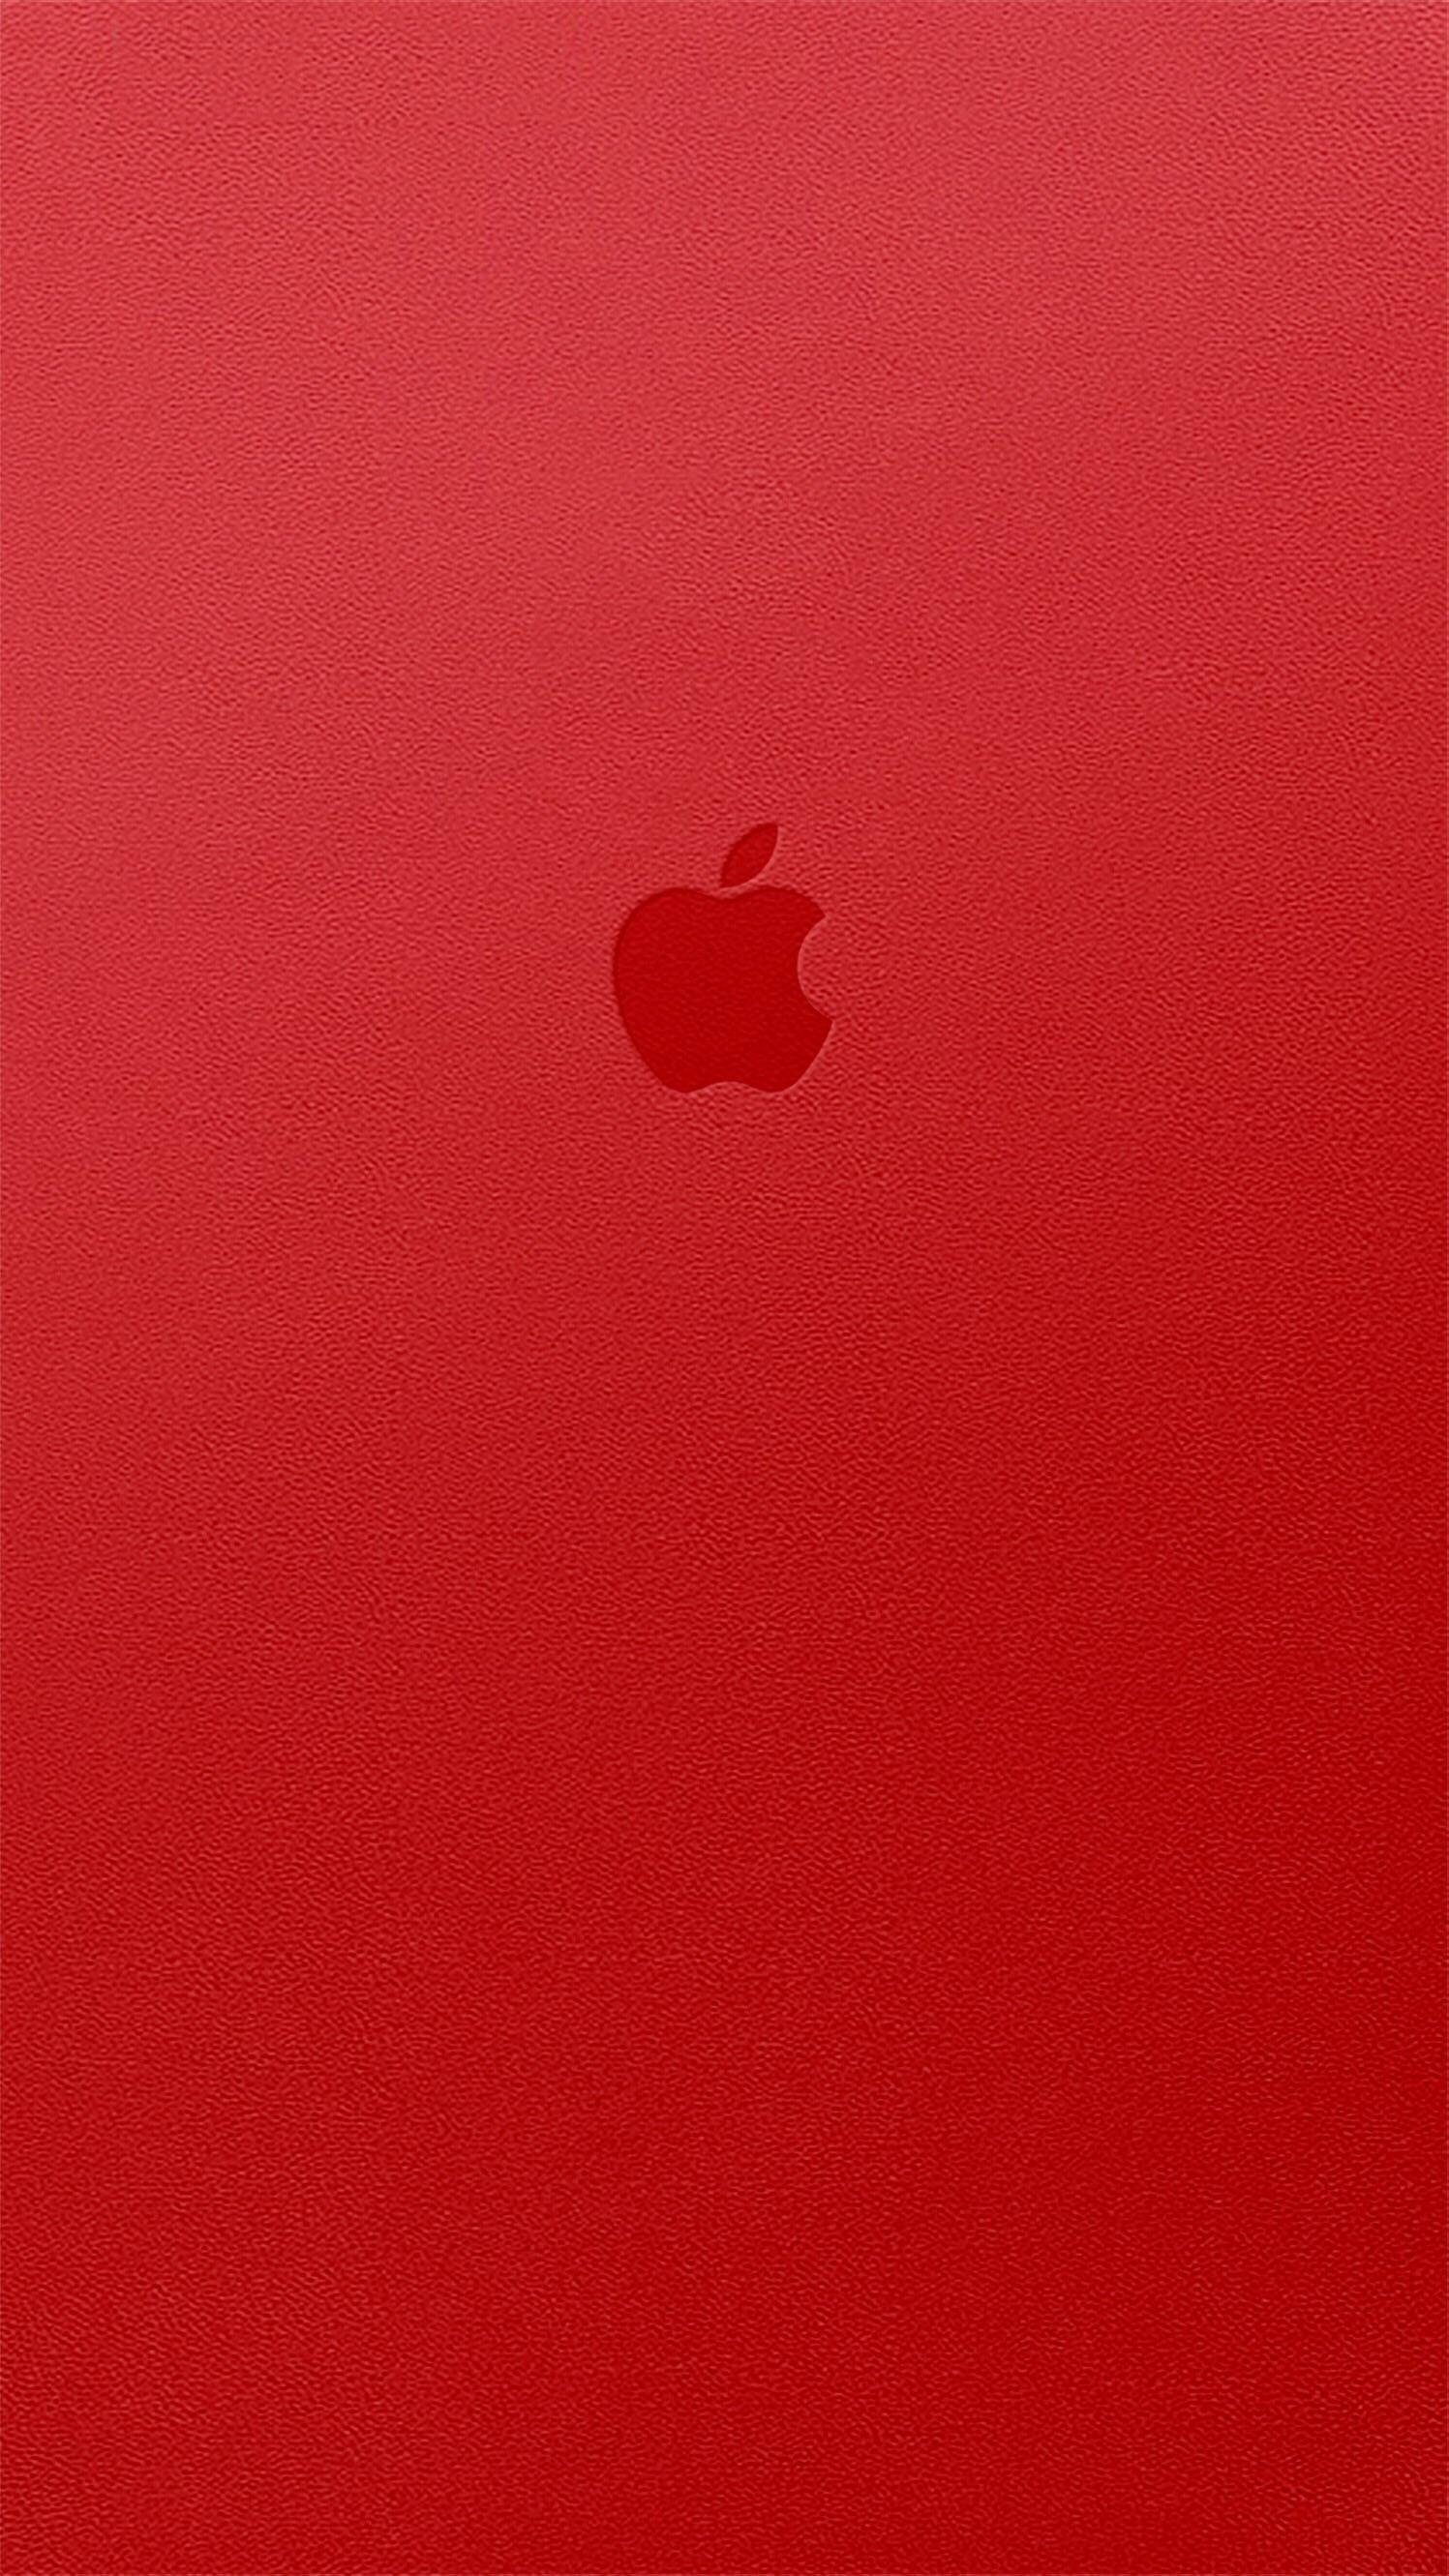 Res: 1497x2662, Red iPhone wallpaper : iWallpaper